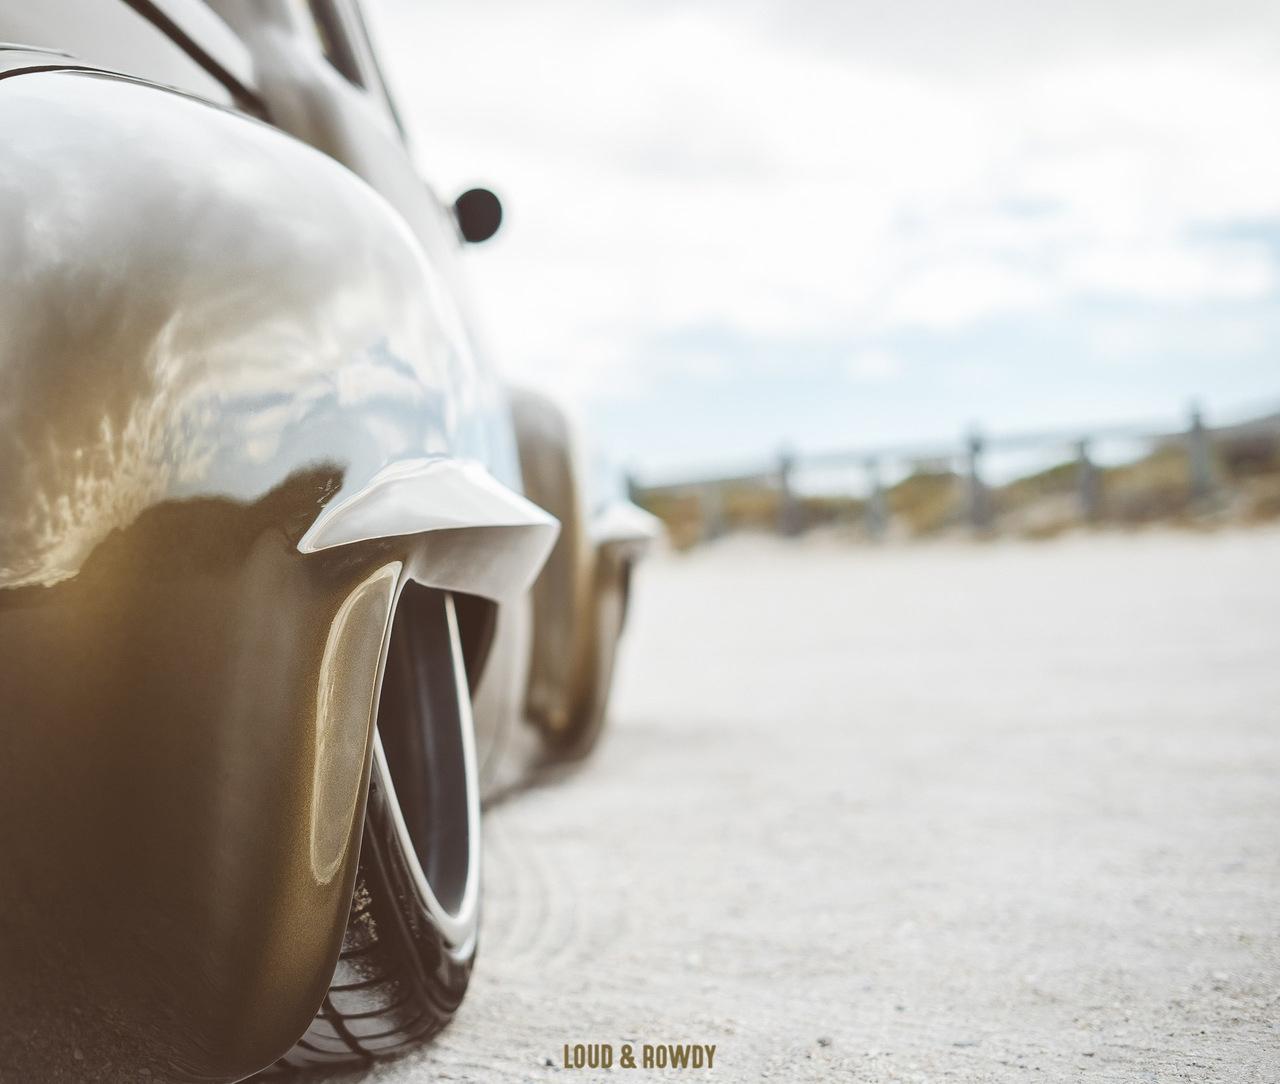 '56 Studebaker - Le bestiau de chez Titan Customs 44